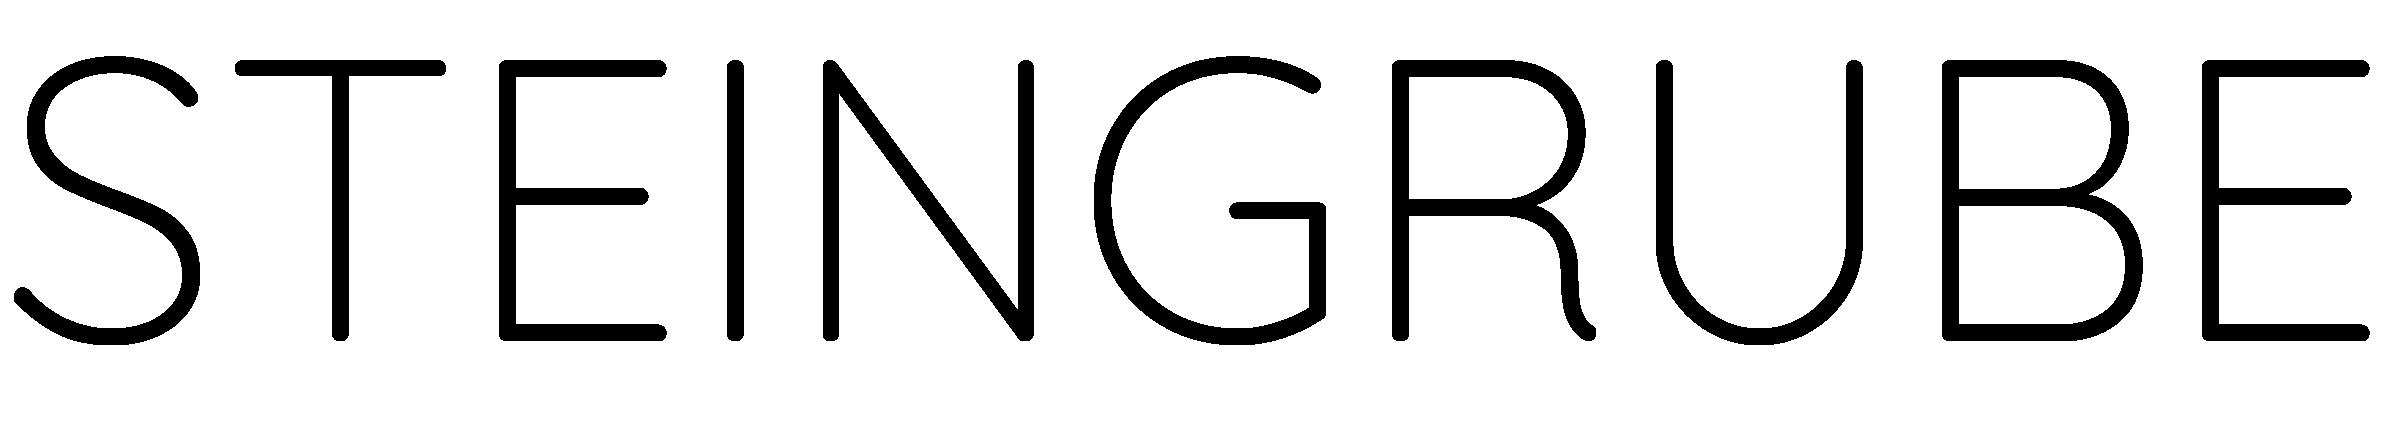 Steingrube Mode